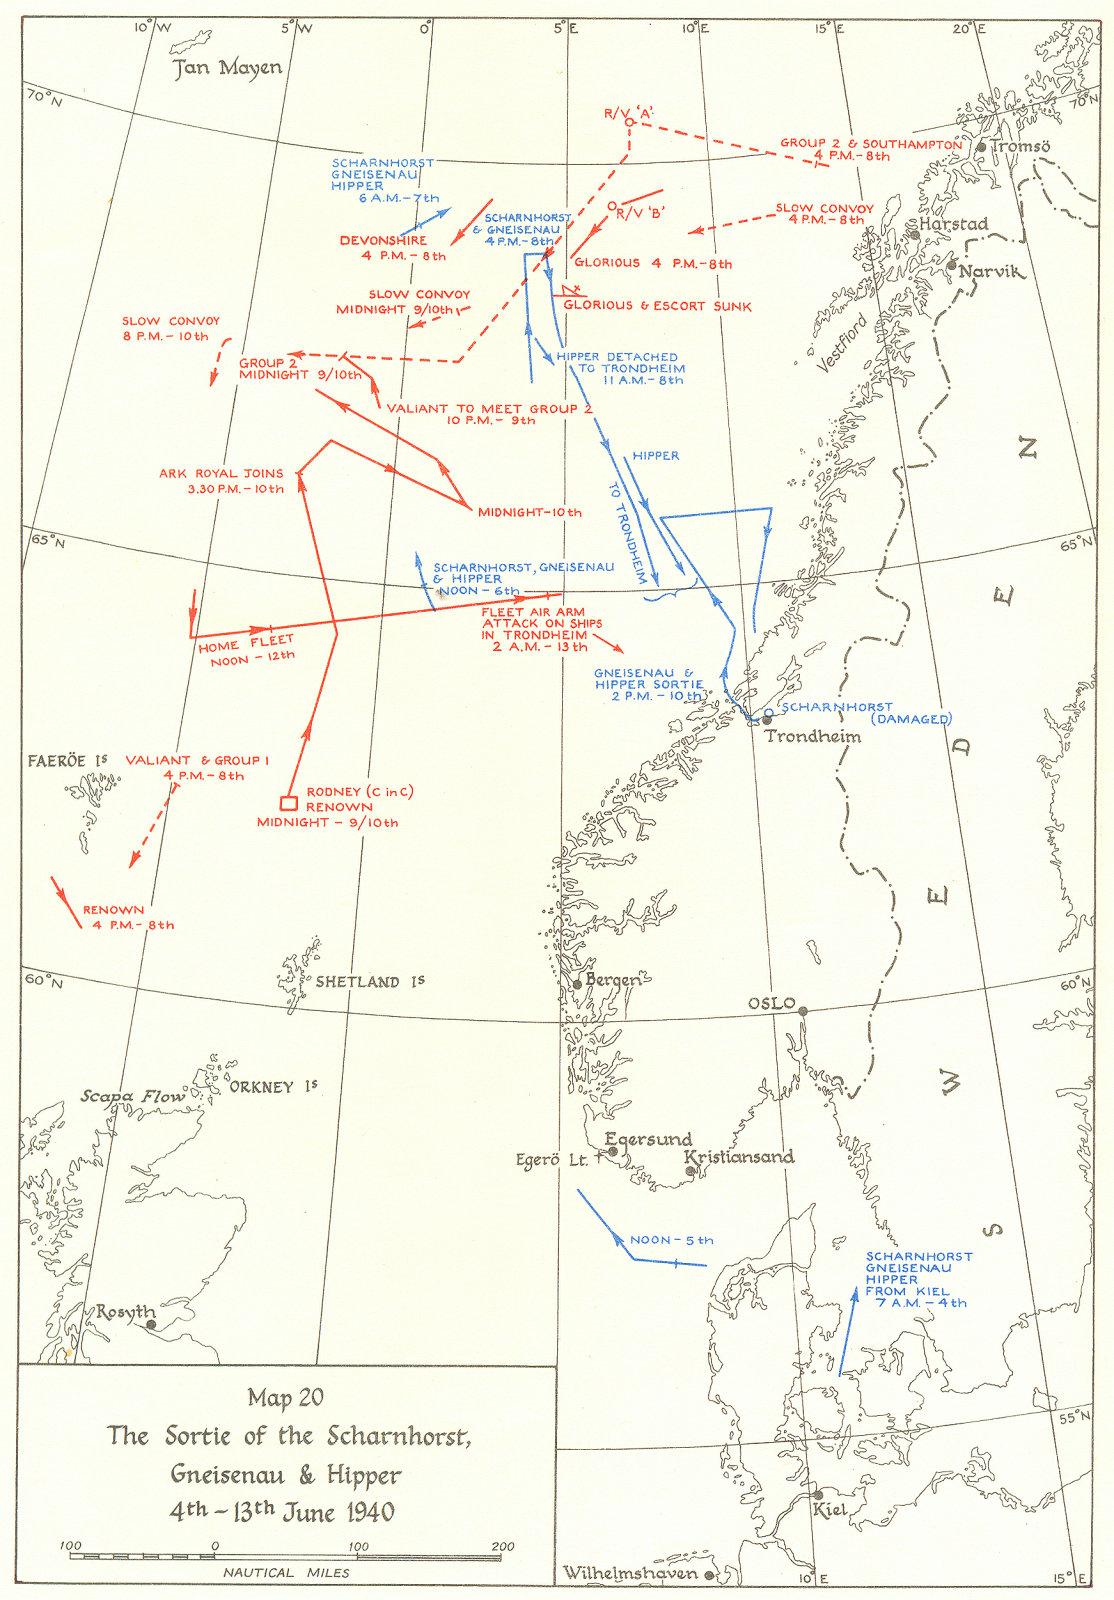 Associate Product NORWEGIAN CAMPAIGN. Scharnhorst, Gneisenau & Hipper, 4-13 June 1940 1954 map